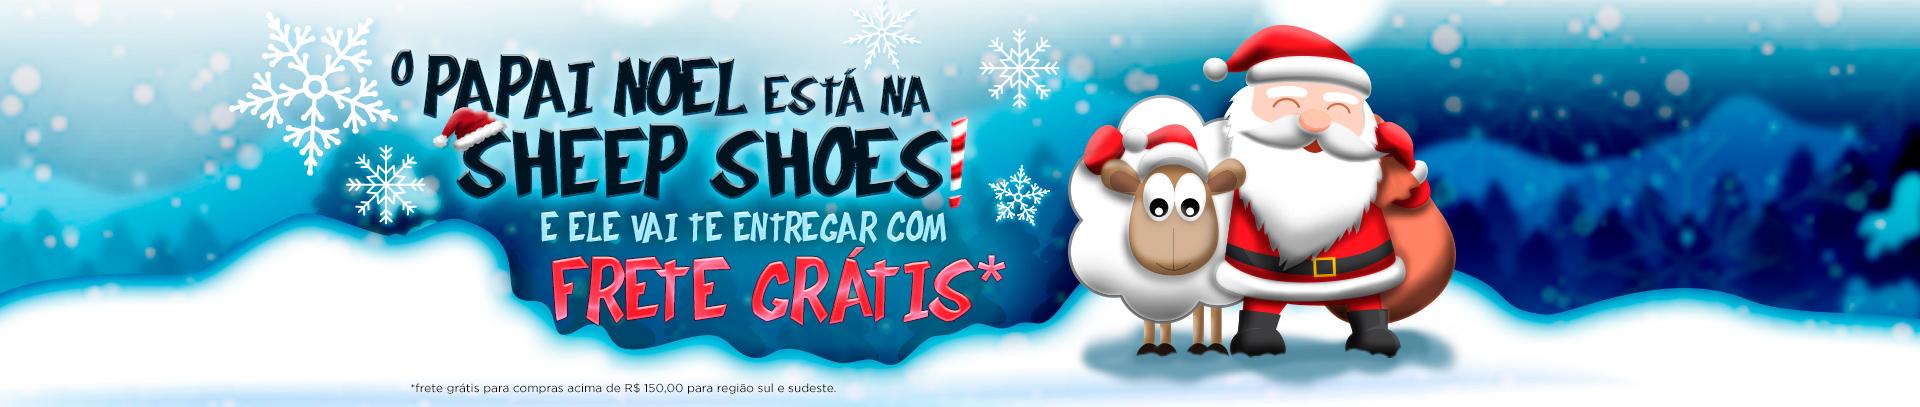 Campanha Tdzain: Natal 2018